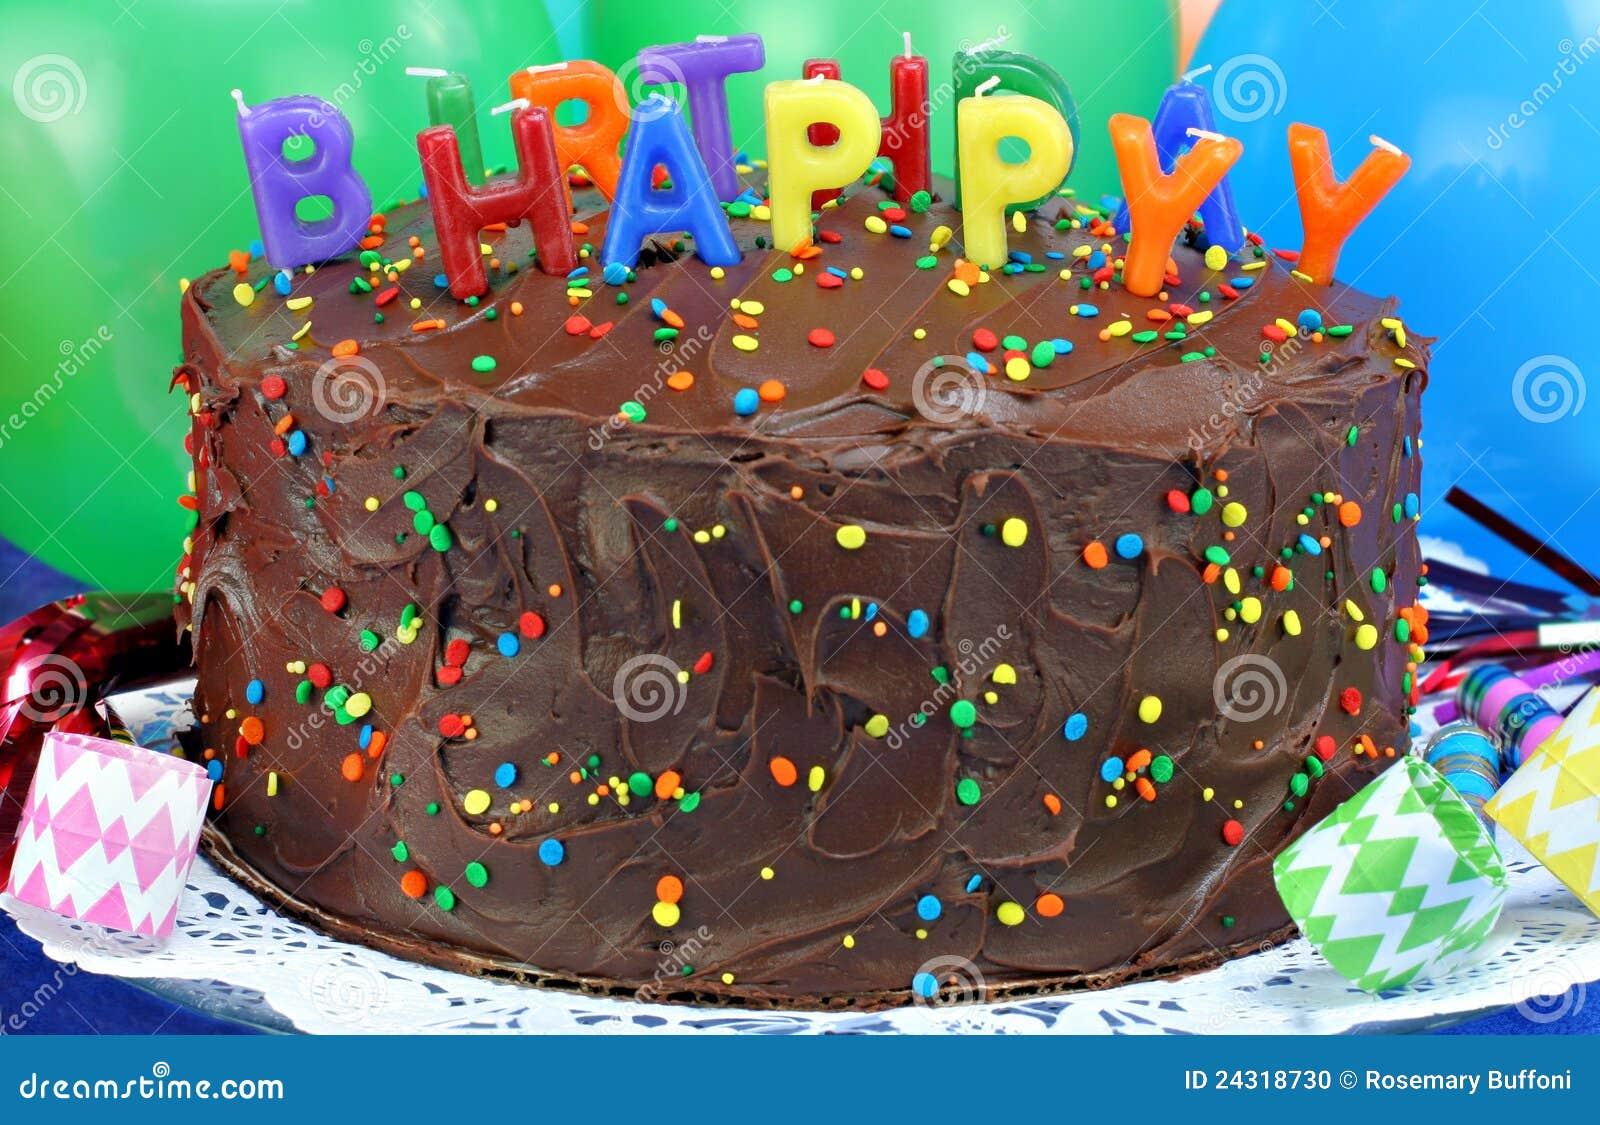 Chocolate Cake Happy Birthday Candles Stock Photo Image Of